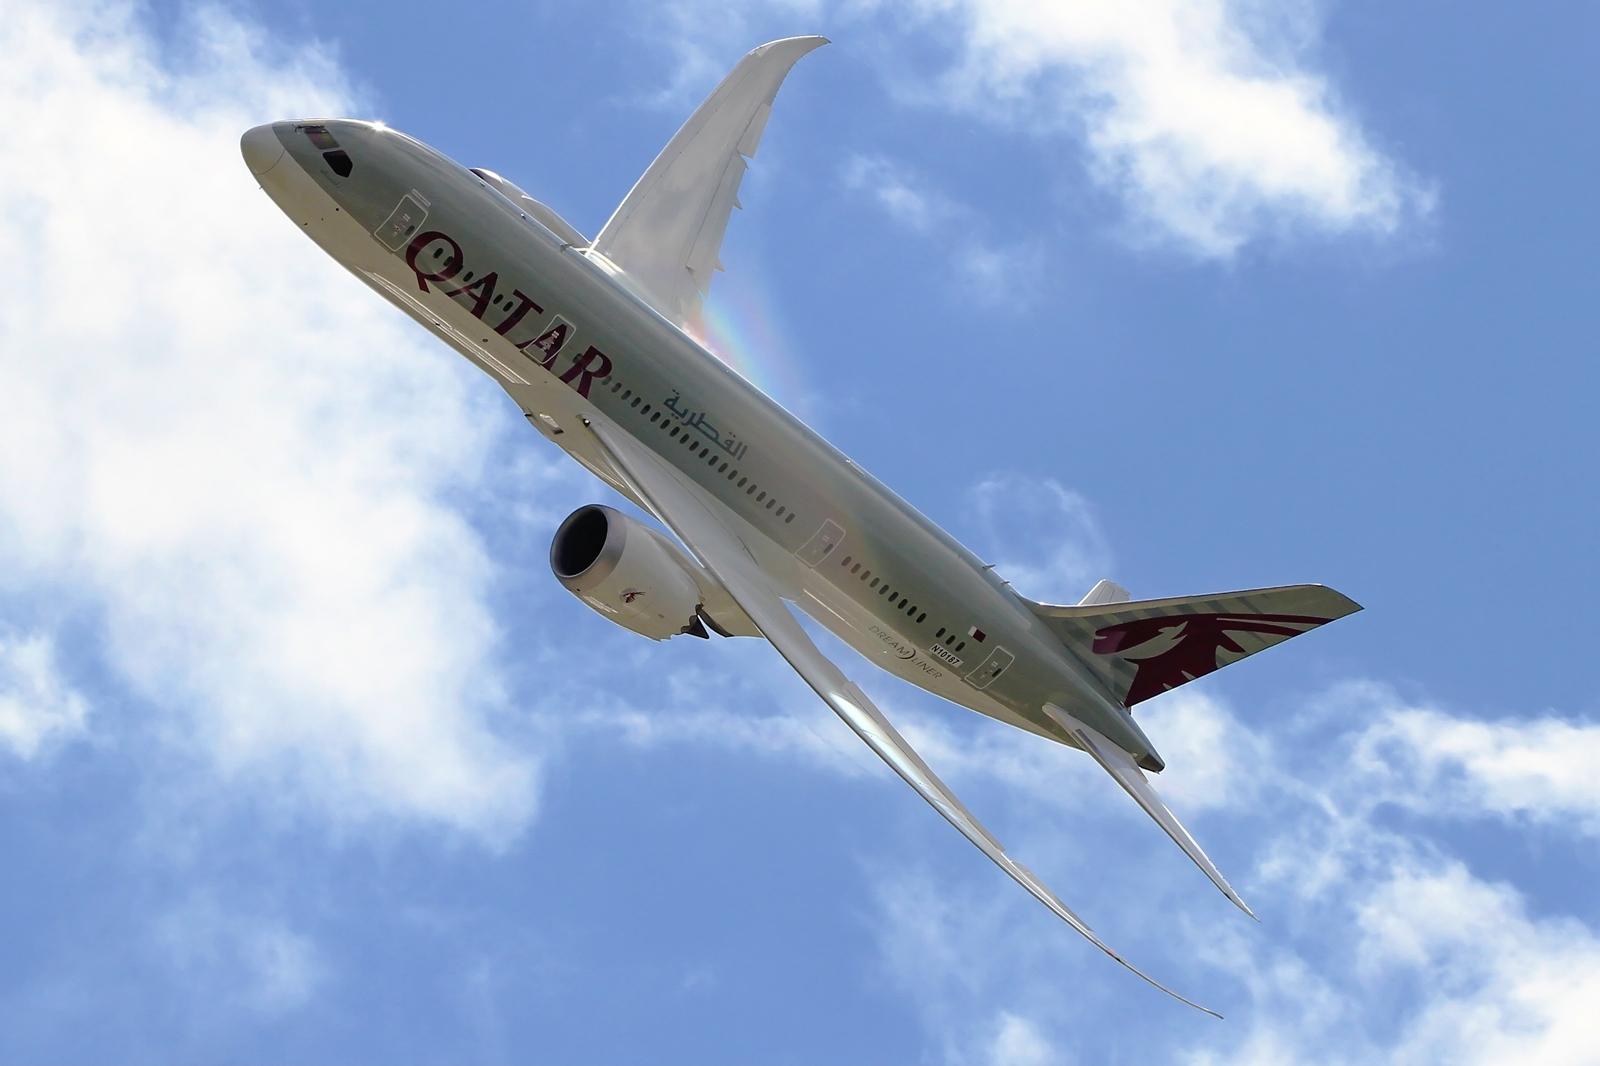 Wallpapers Libs Boeing 787 Wallpaper Dreamline Planes Sky